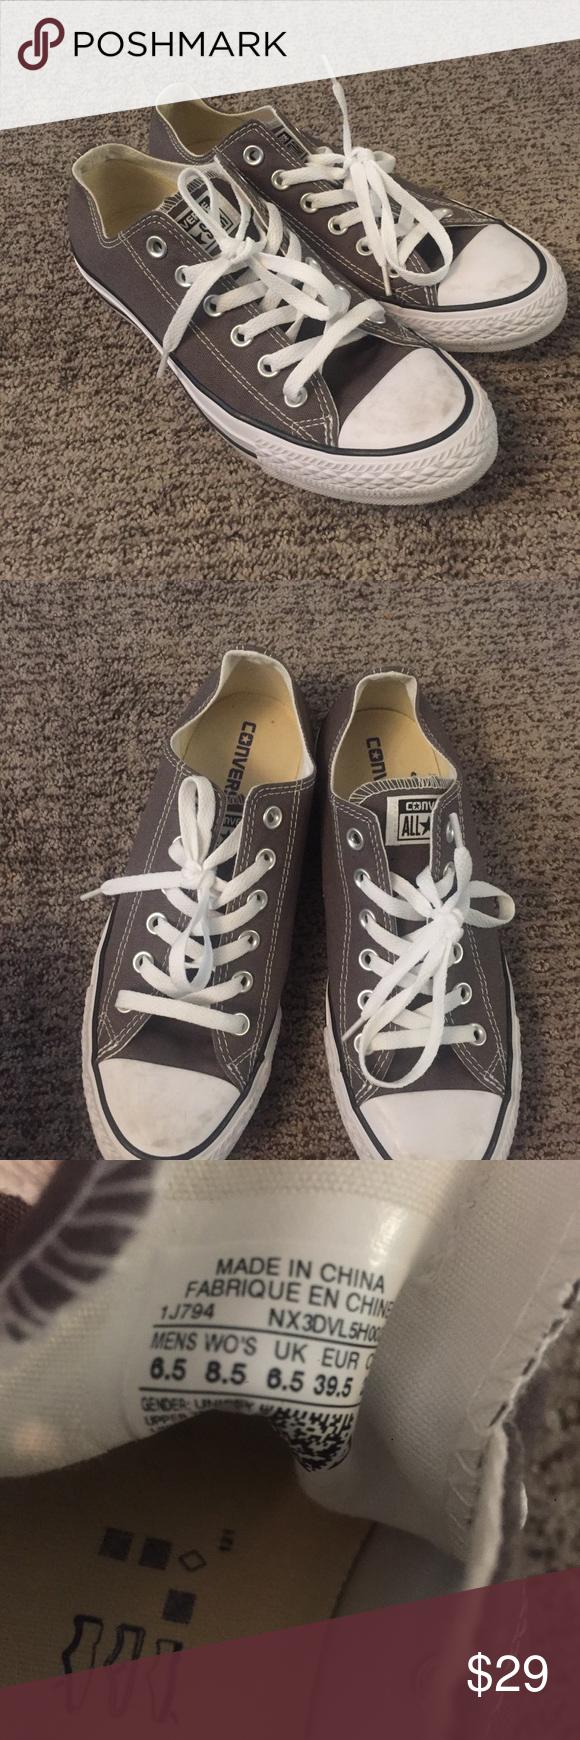 725cc00b0929 Converse chuck Norris gray women 8.5 men 6.5 Converse chuck Norris gray  women 8.5 men 6.5 great used condition Converse Shoes Sneakers